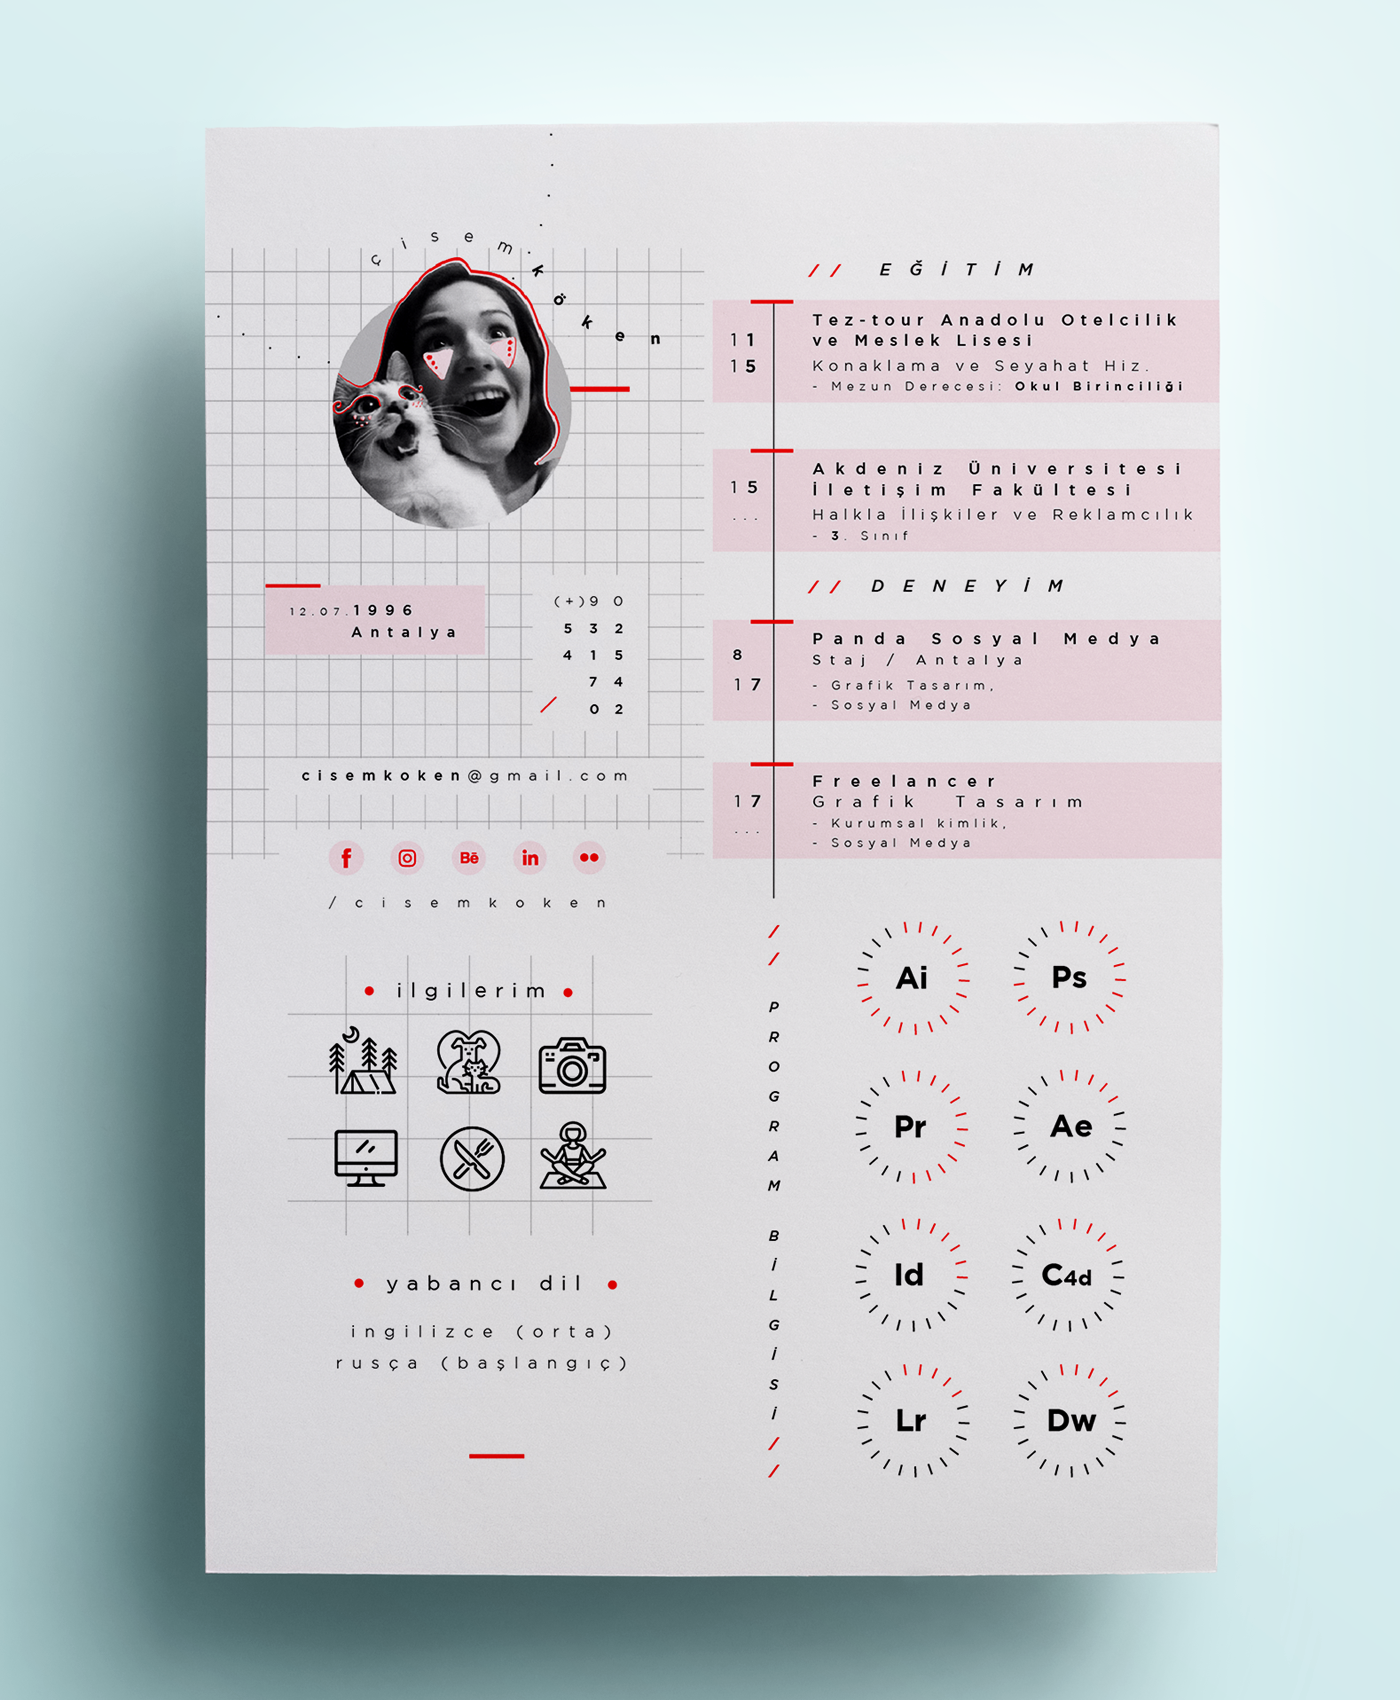 Cv 2 0 1 8 On Behance Graphic Design Resume Graphic Design Cv Resume Design Creative